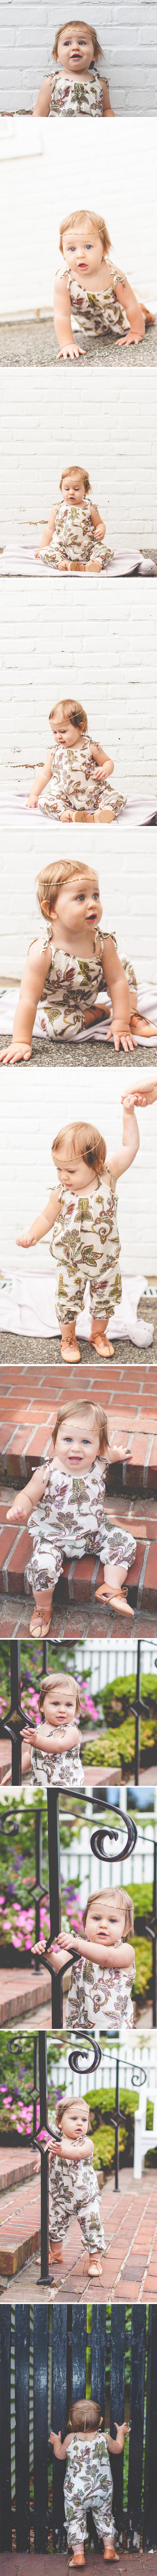 La Petite Peach_Lisa Elazabeth Images